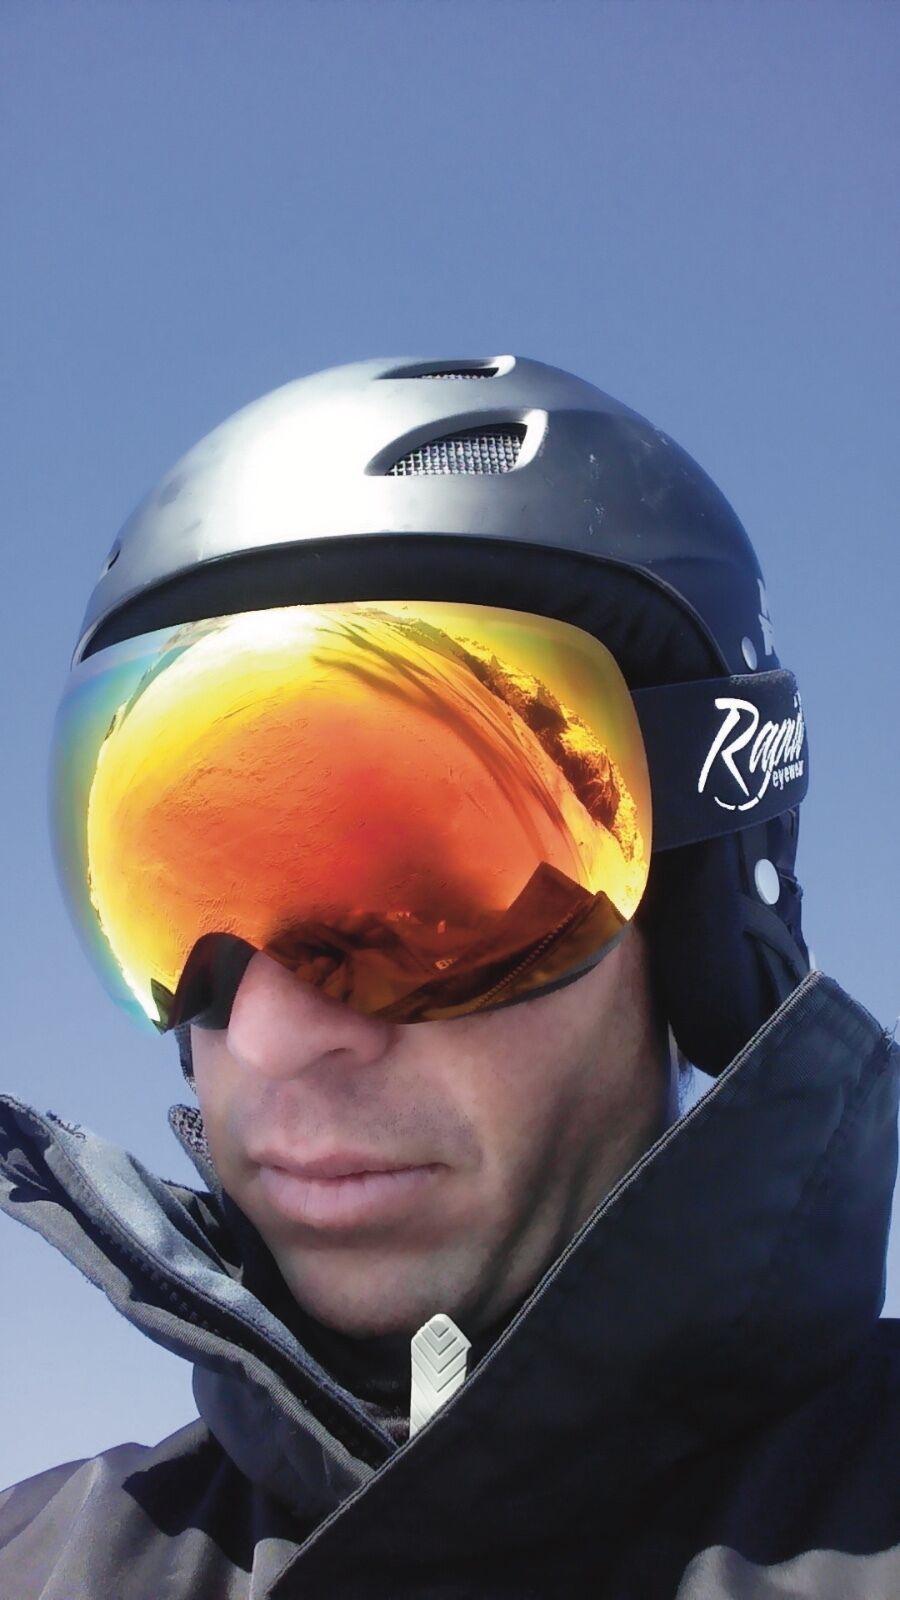 SKIBRILLE MIT SEHSTÄRKE: CLIP für Brillenträger. Verspiegelt UV. Optik Optik Optik inklusive 3b83fa